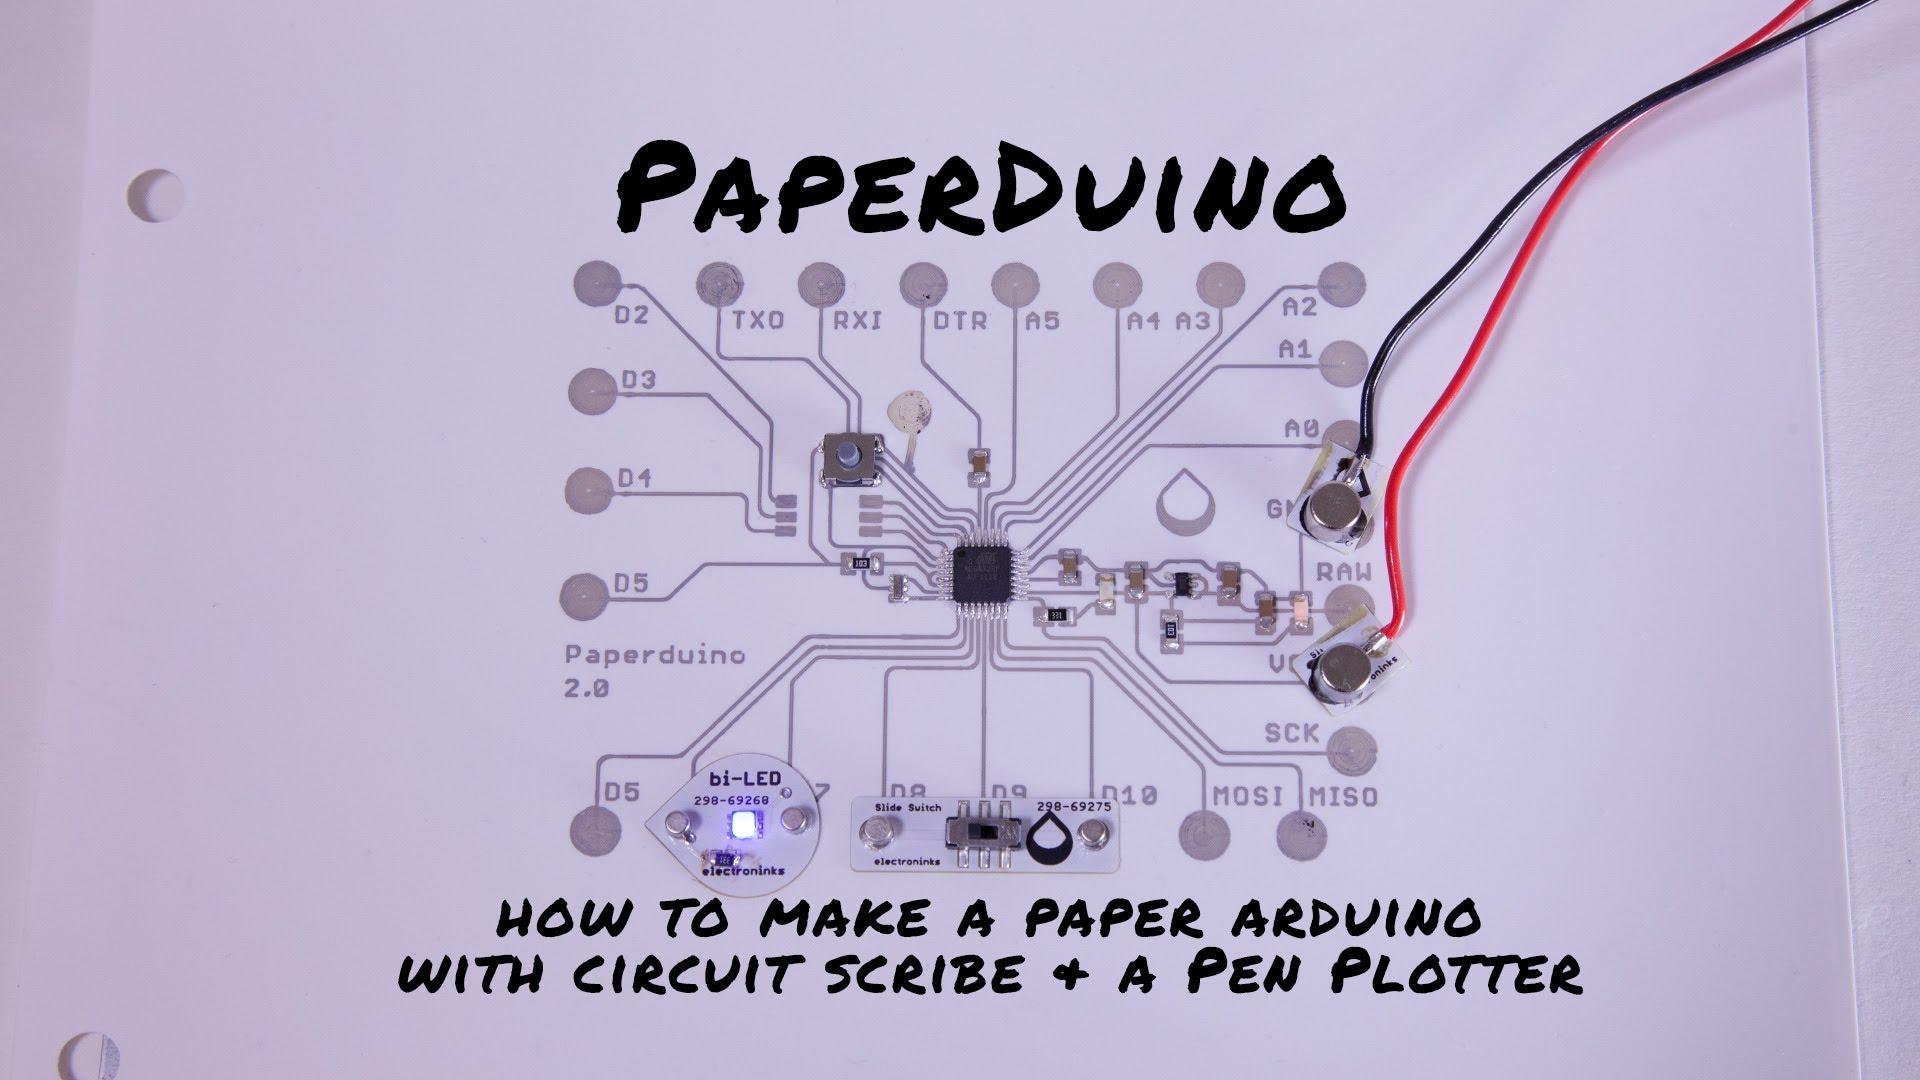 Paperduino 2.0 with Circuit Scribe – Paper Arduino! #arduino #conductiveink